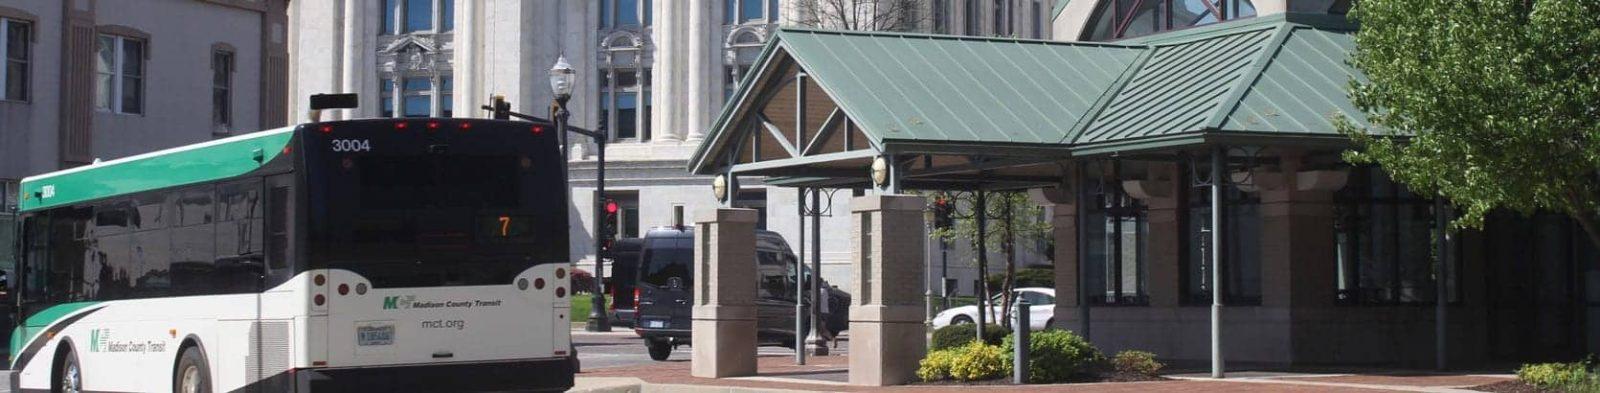 Edwardsville public transportation accident lawyer; edwardsville public transportation law firm; edwardsville public transportation accident lawsuit settlements